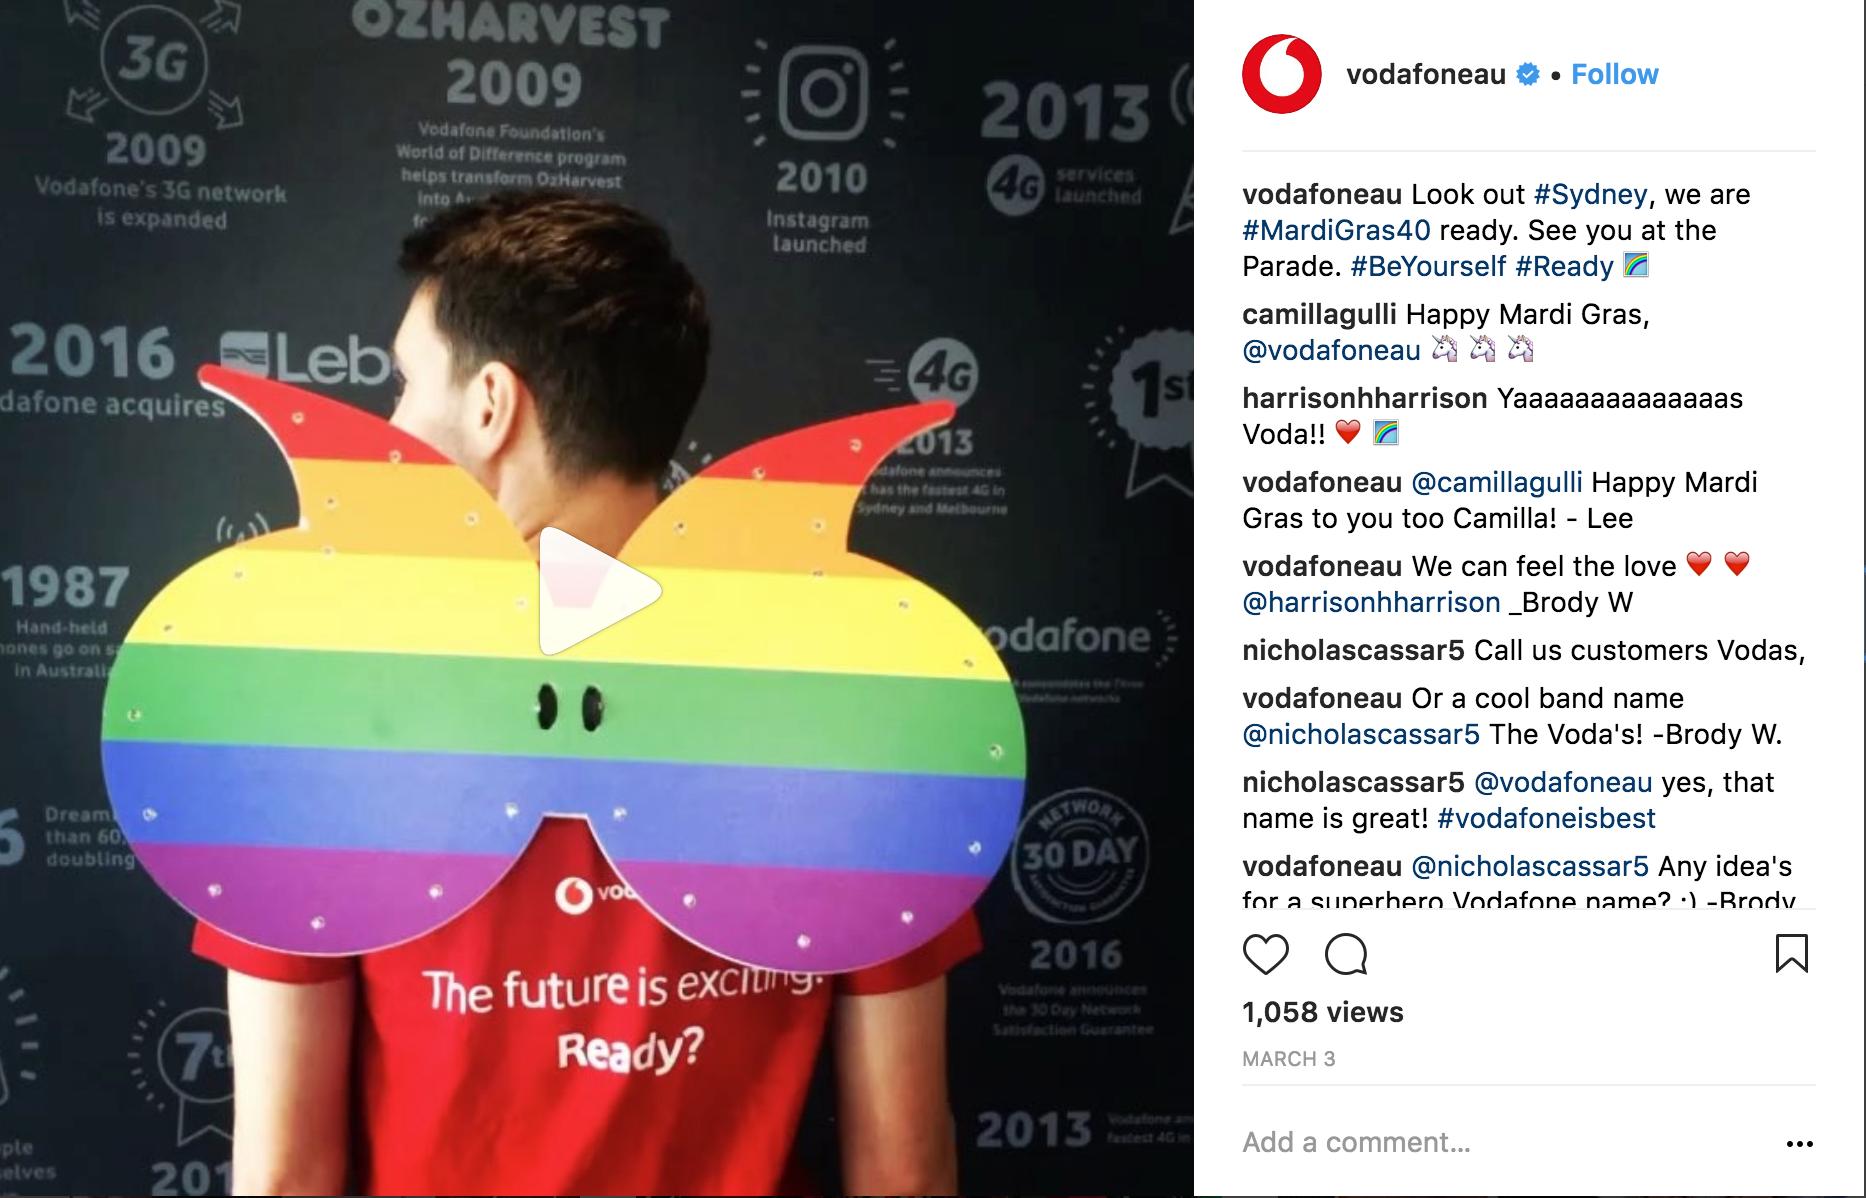 Vodafone Instagram